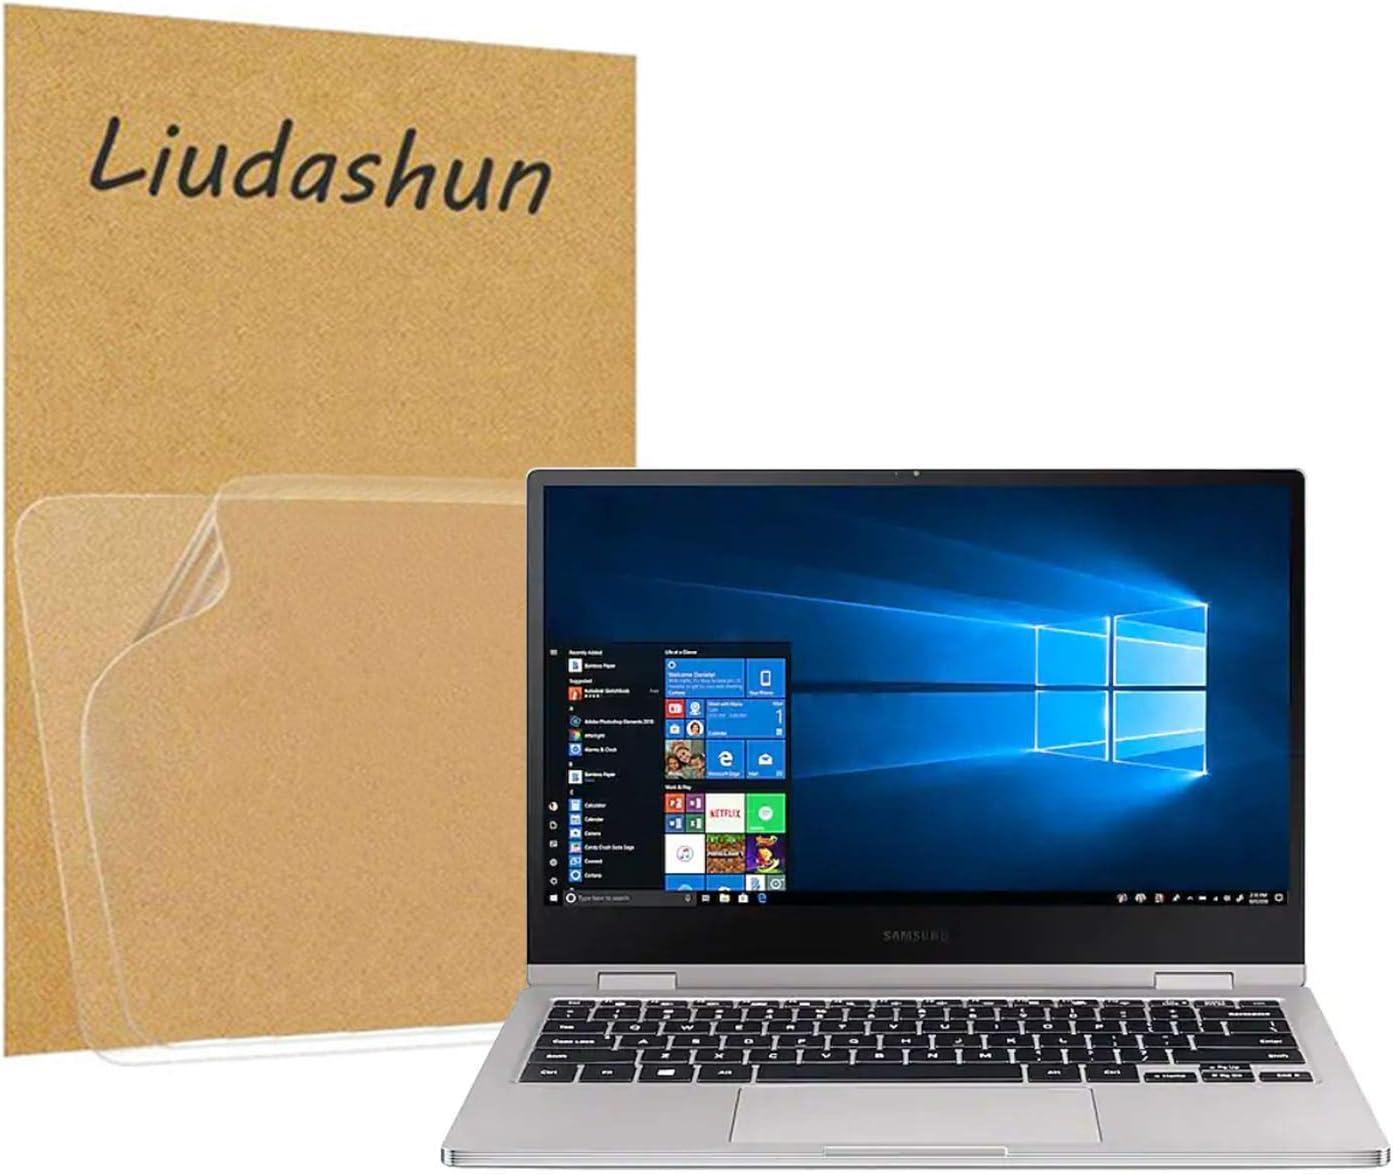 "Liudashun Screen Protector for Samsung Notebook 9 pro (NP930MBE NP930MBE-K01US NP930MBE-K04US NP930MBE-K02US NP930MBE-K03US) 2019 13.3"" Laptop [2 PACK]"